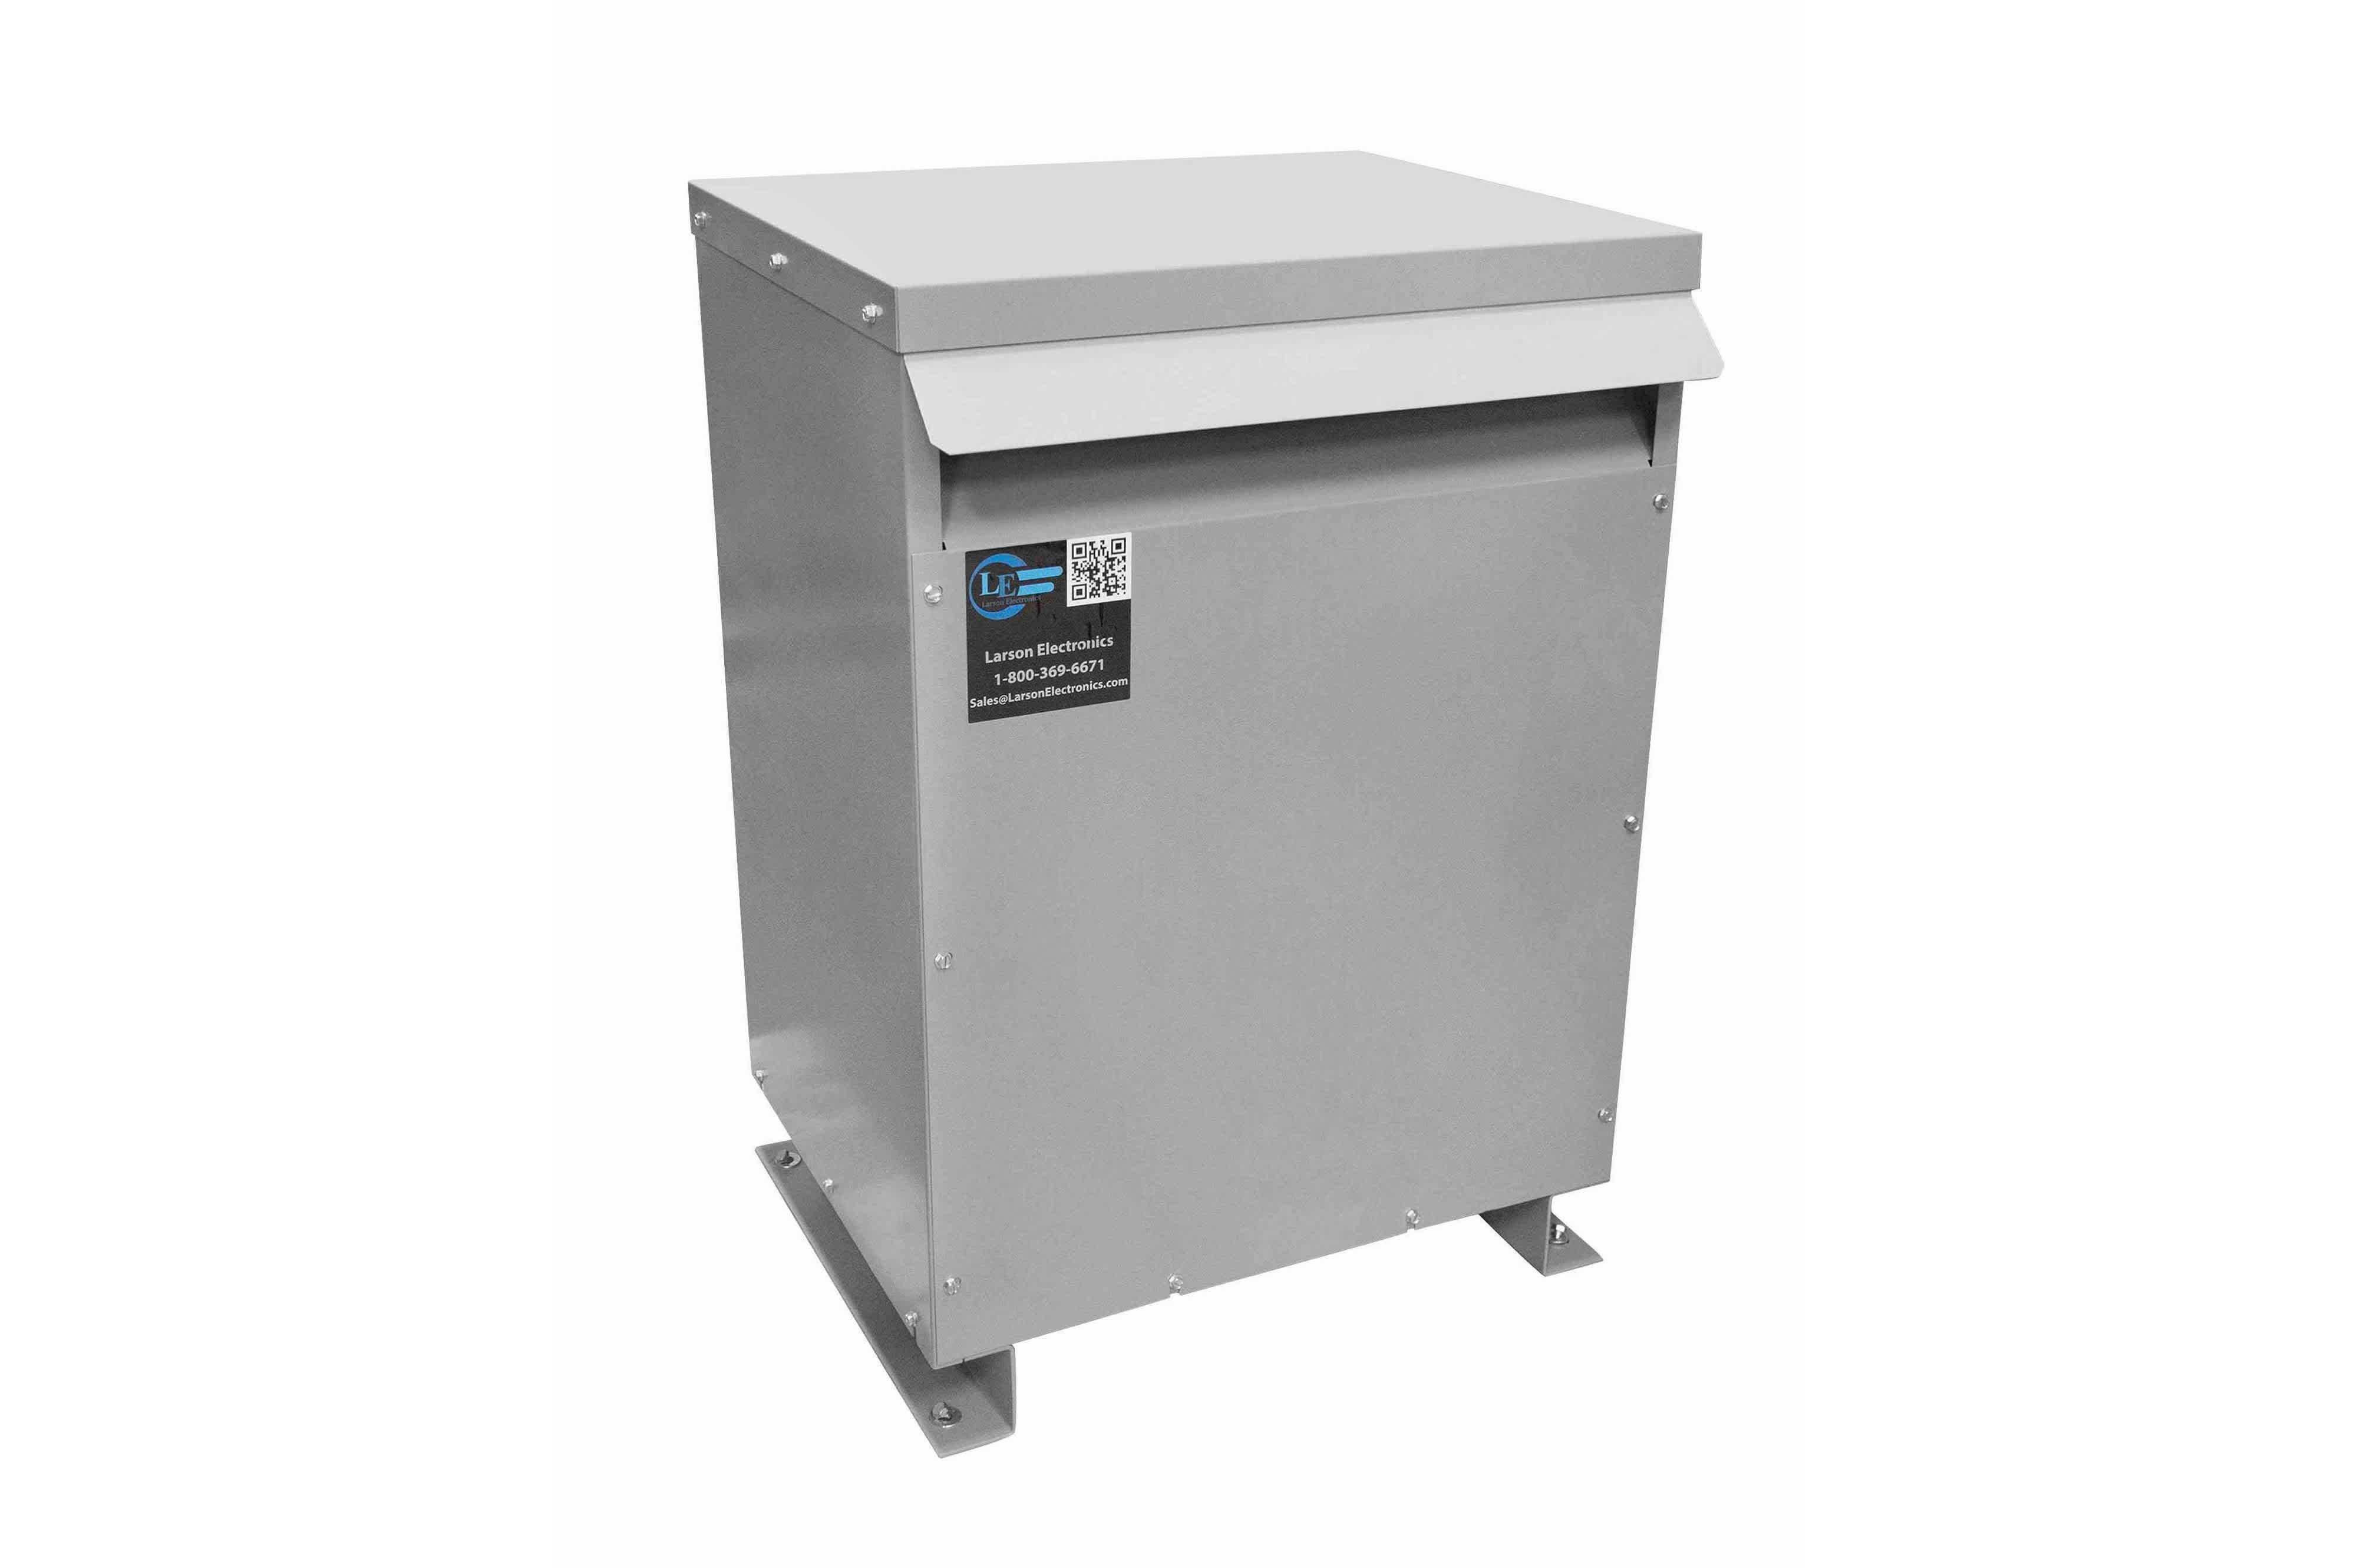 200 kVA 3PH DOE Transformer, 208V Delta Primary, 380Y/220 Wye-N Secondary, N3R, Ventilated, 60 Hz